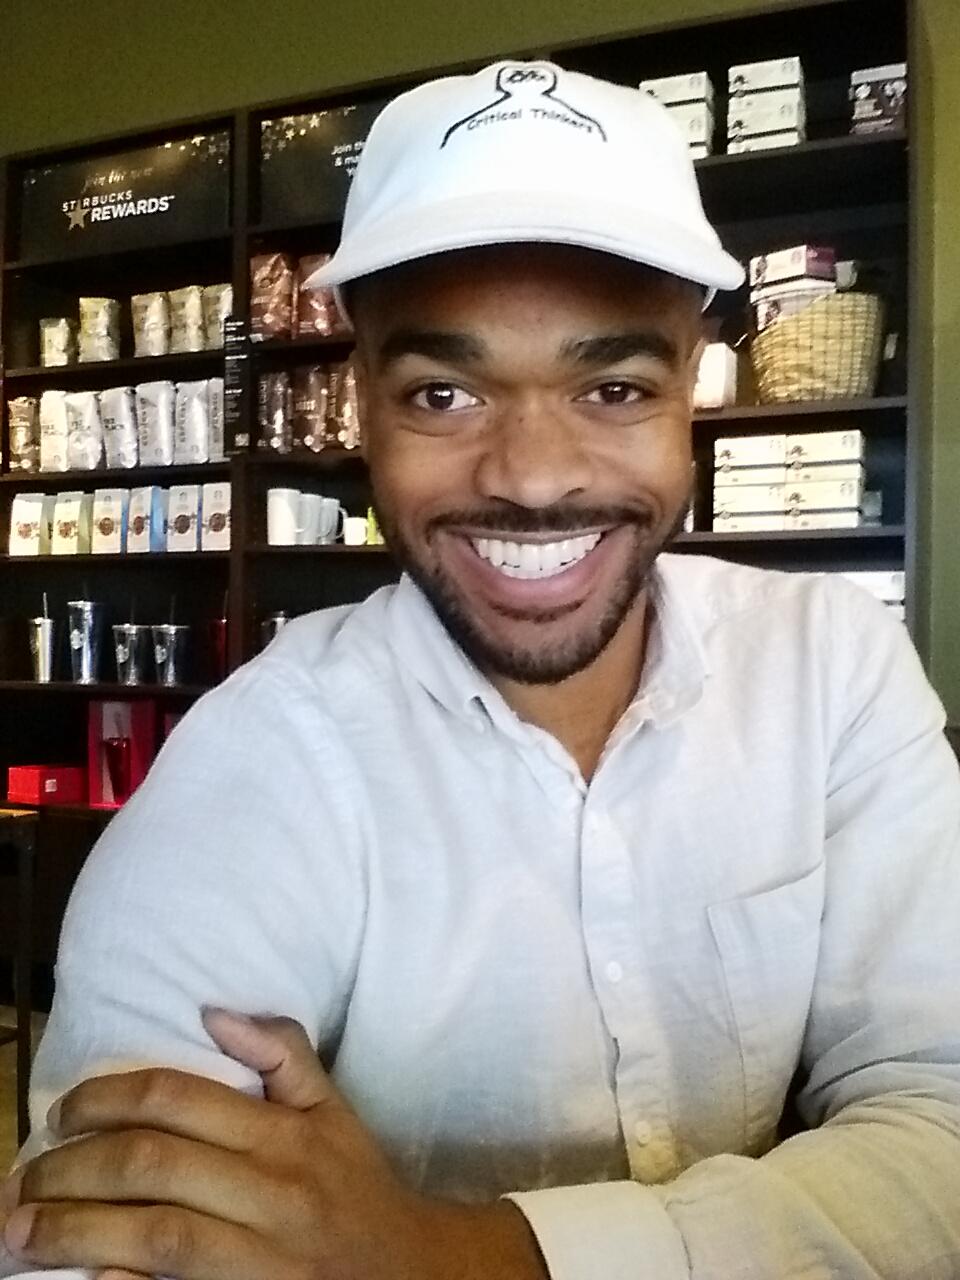 Image of @founderctc at Bluerock Starbucks